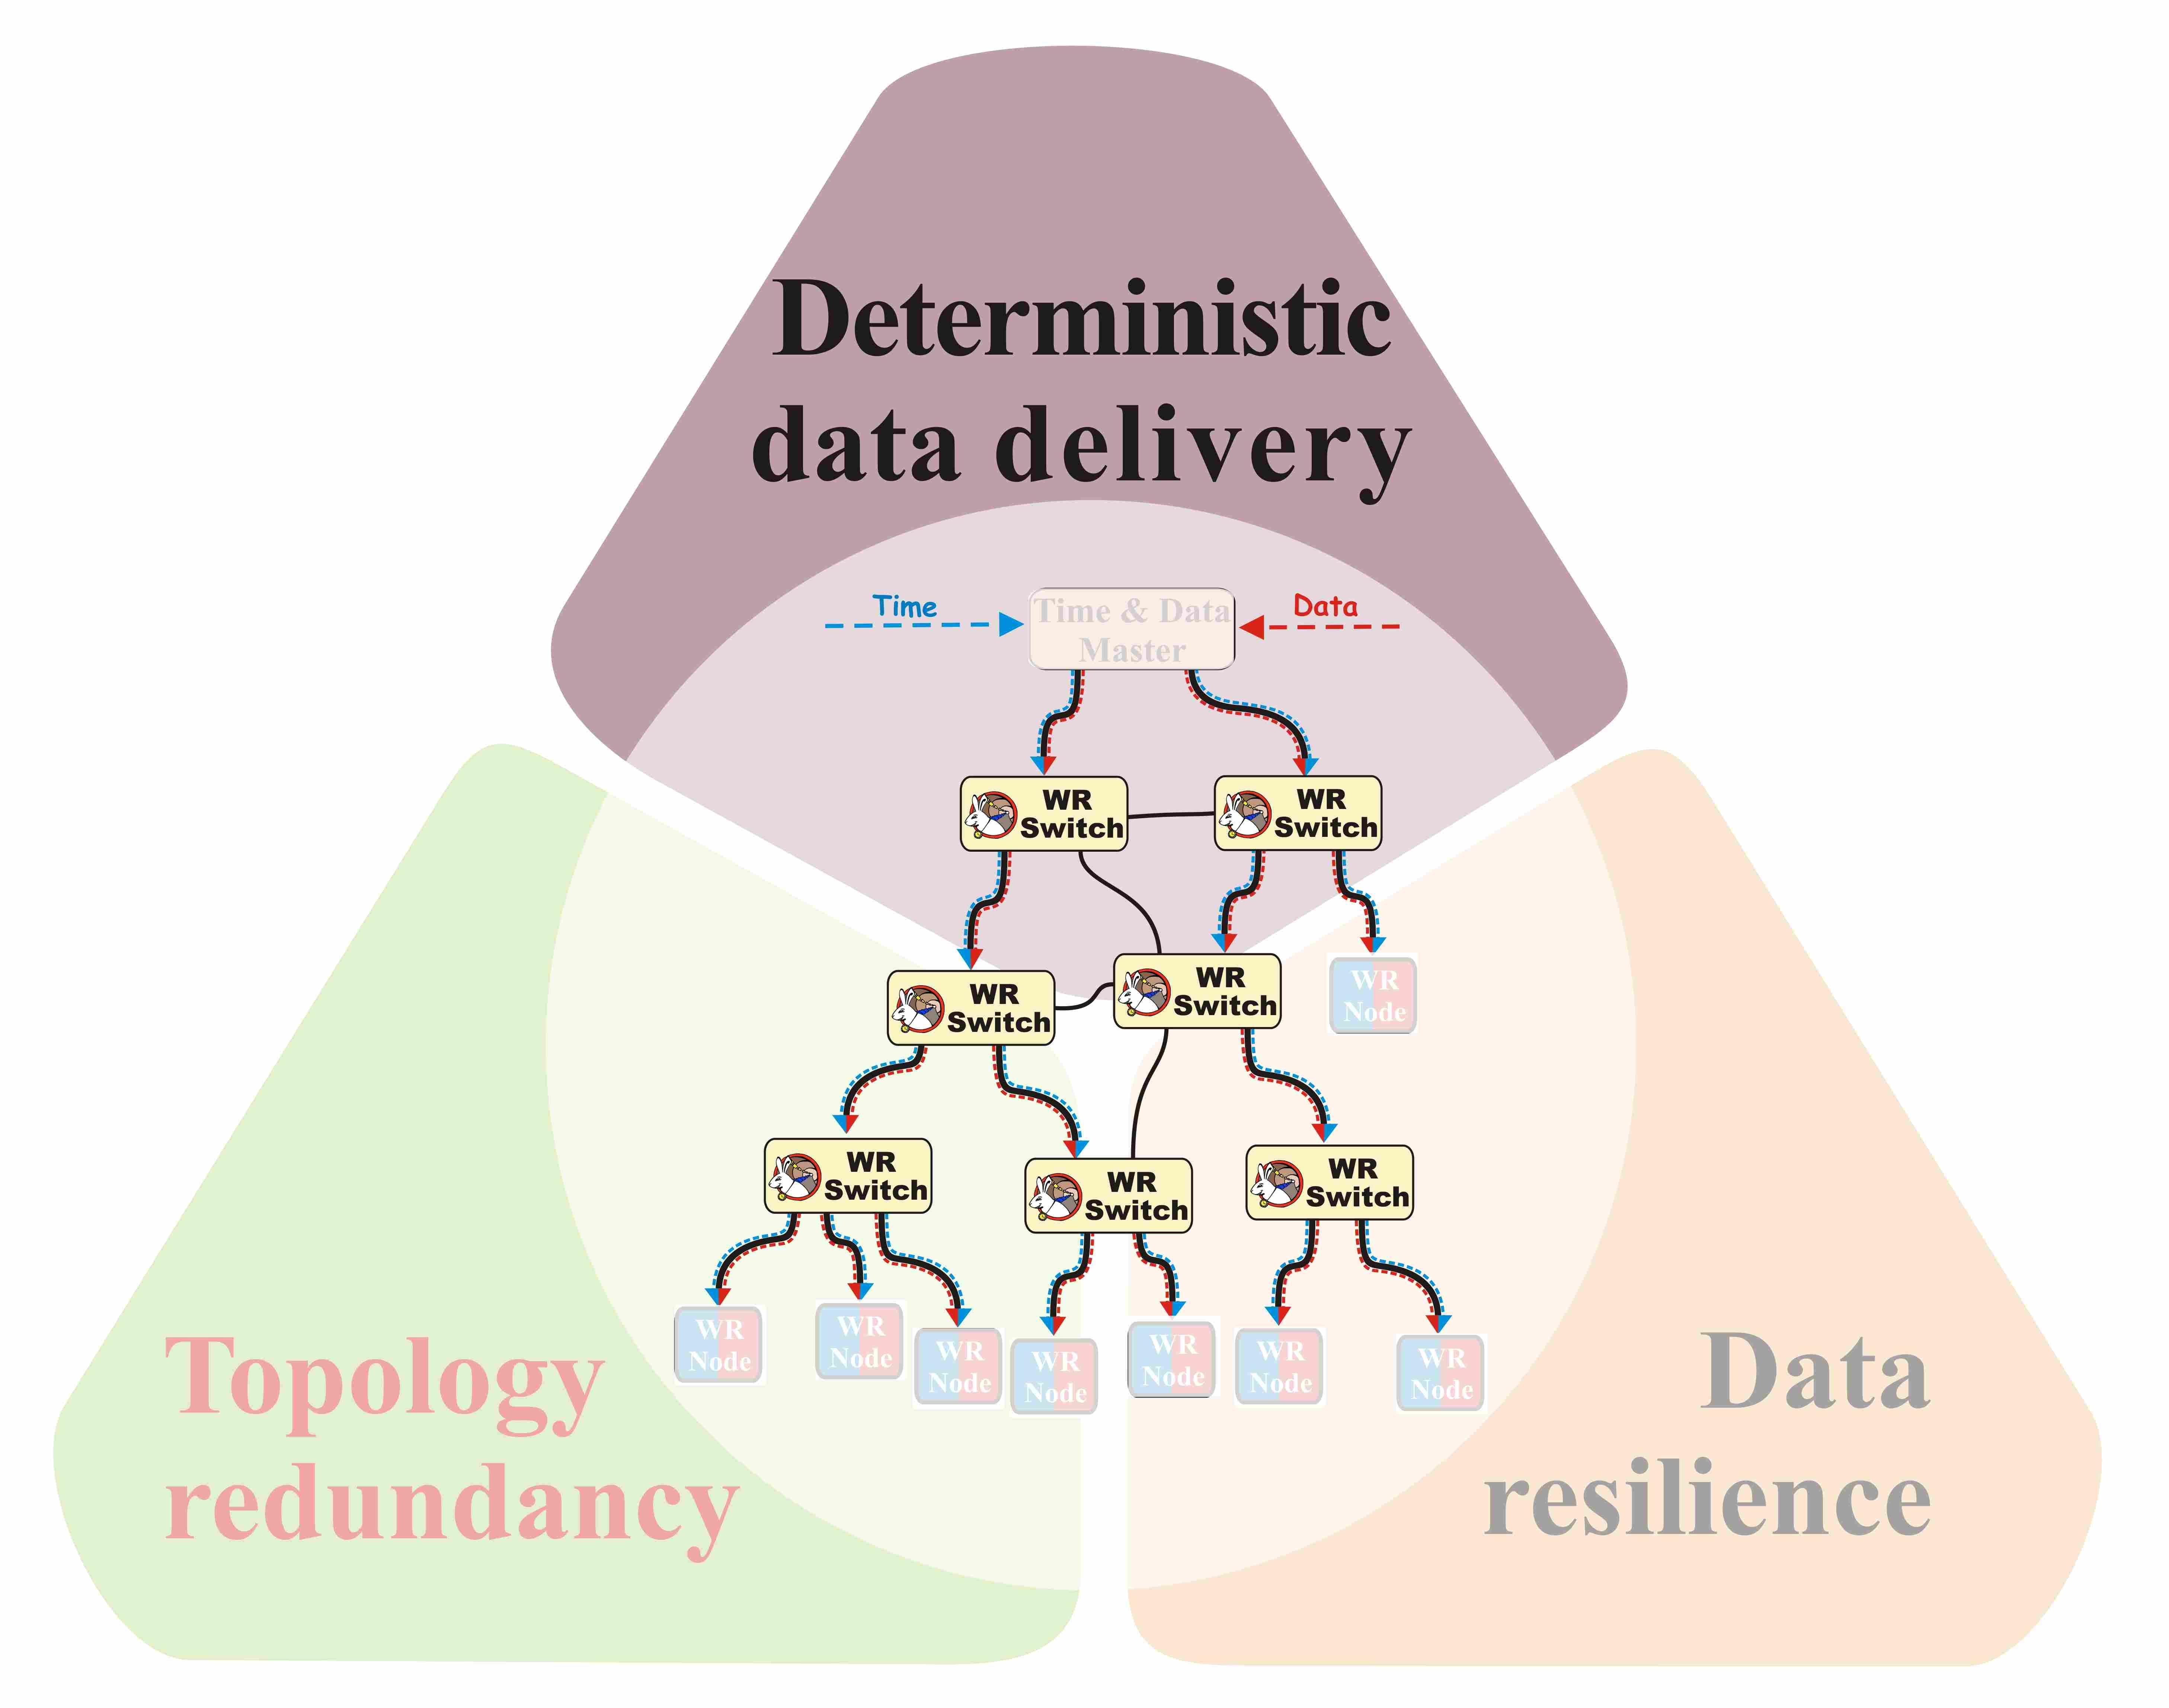 figures/robustness/data_dist_rel_determinism.jpg